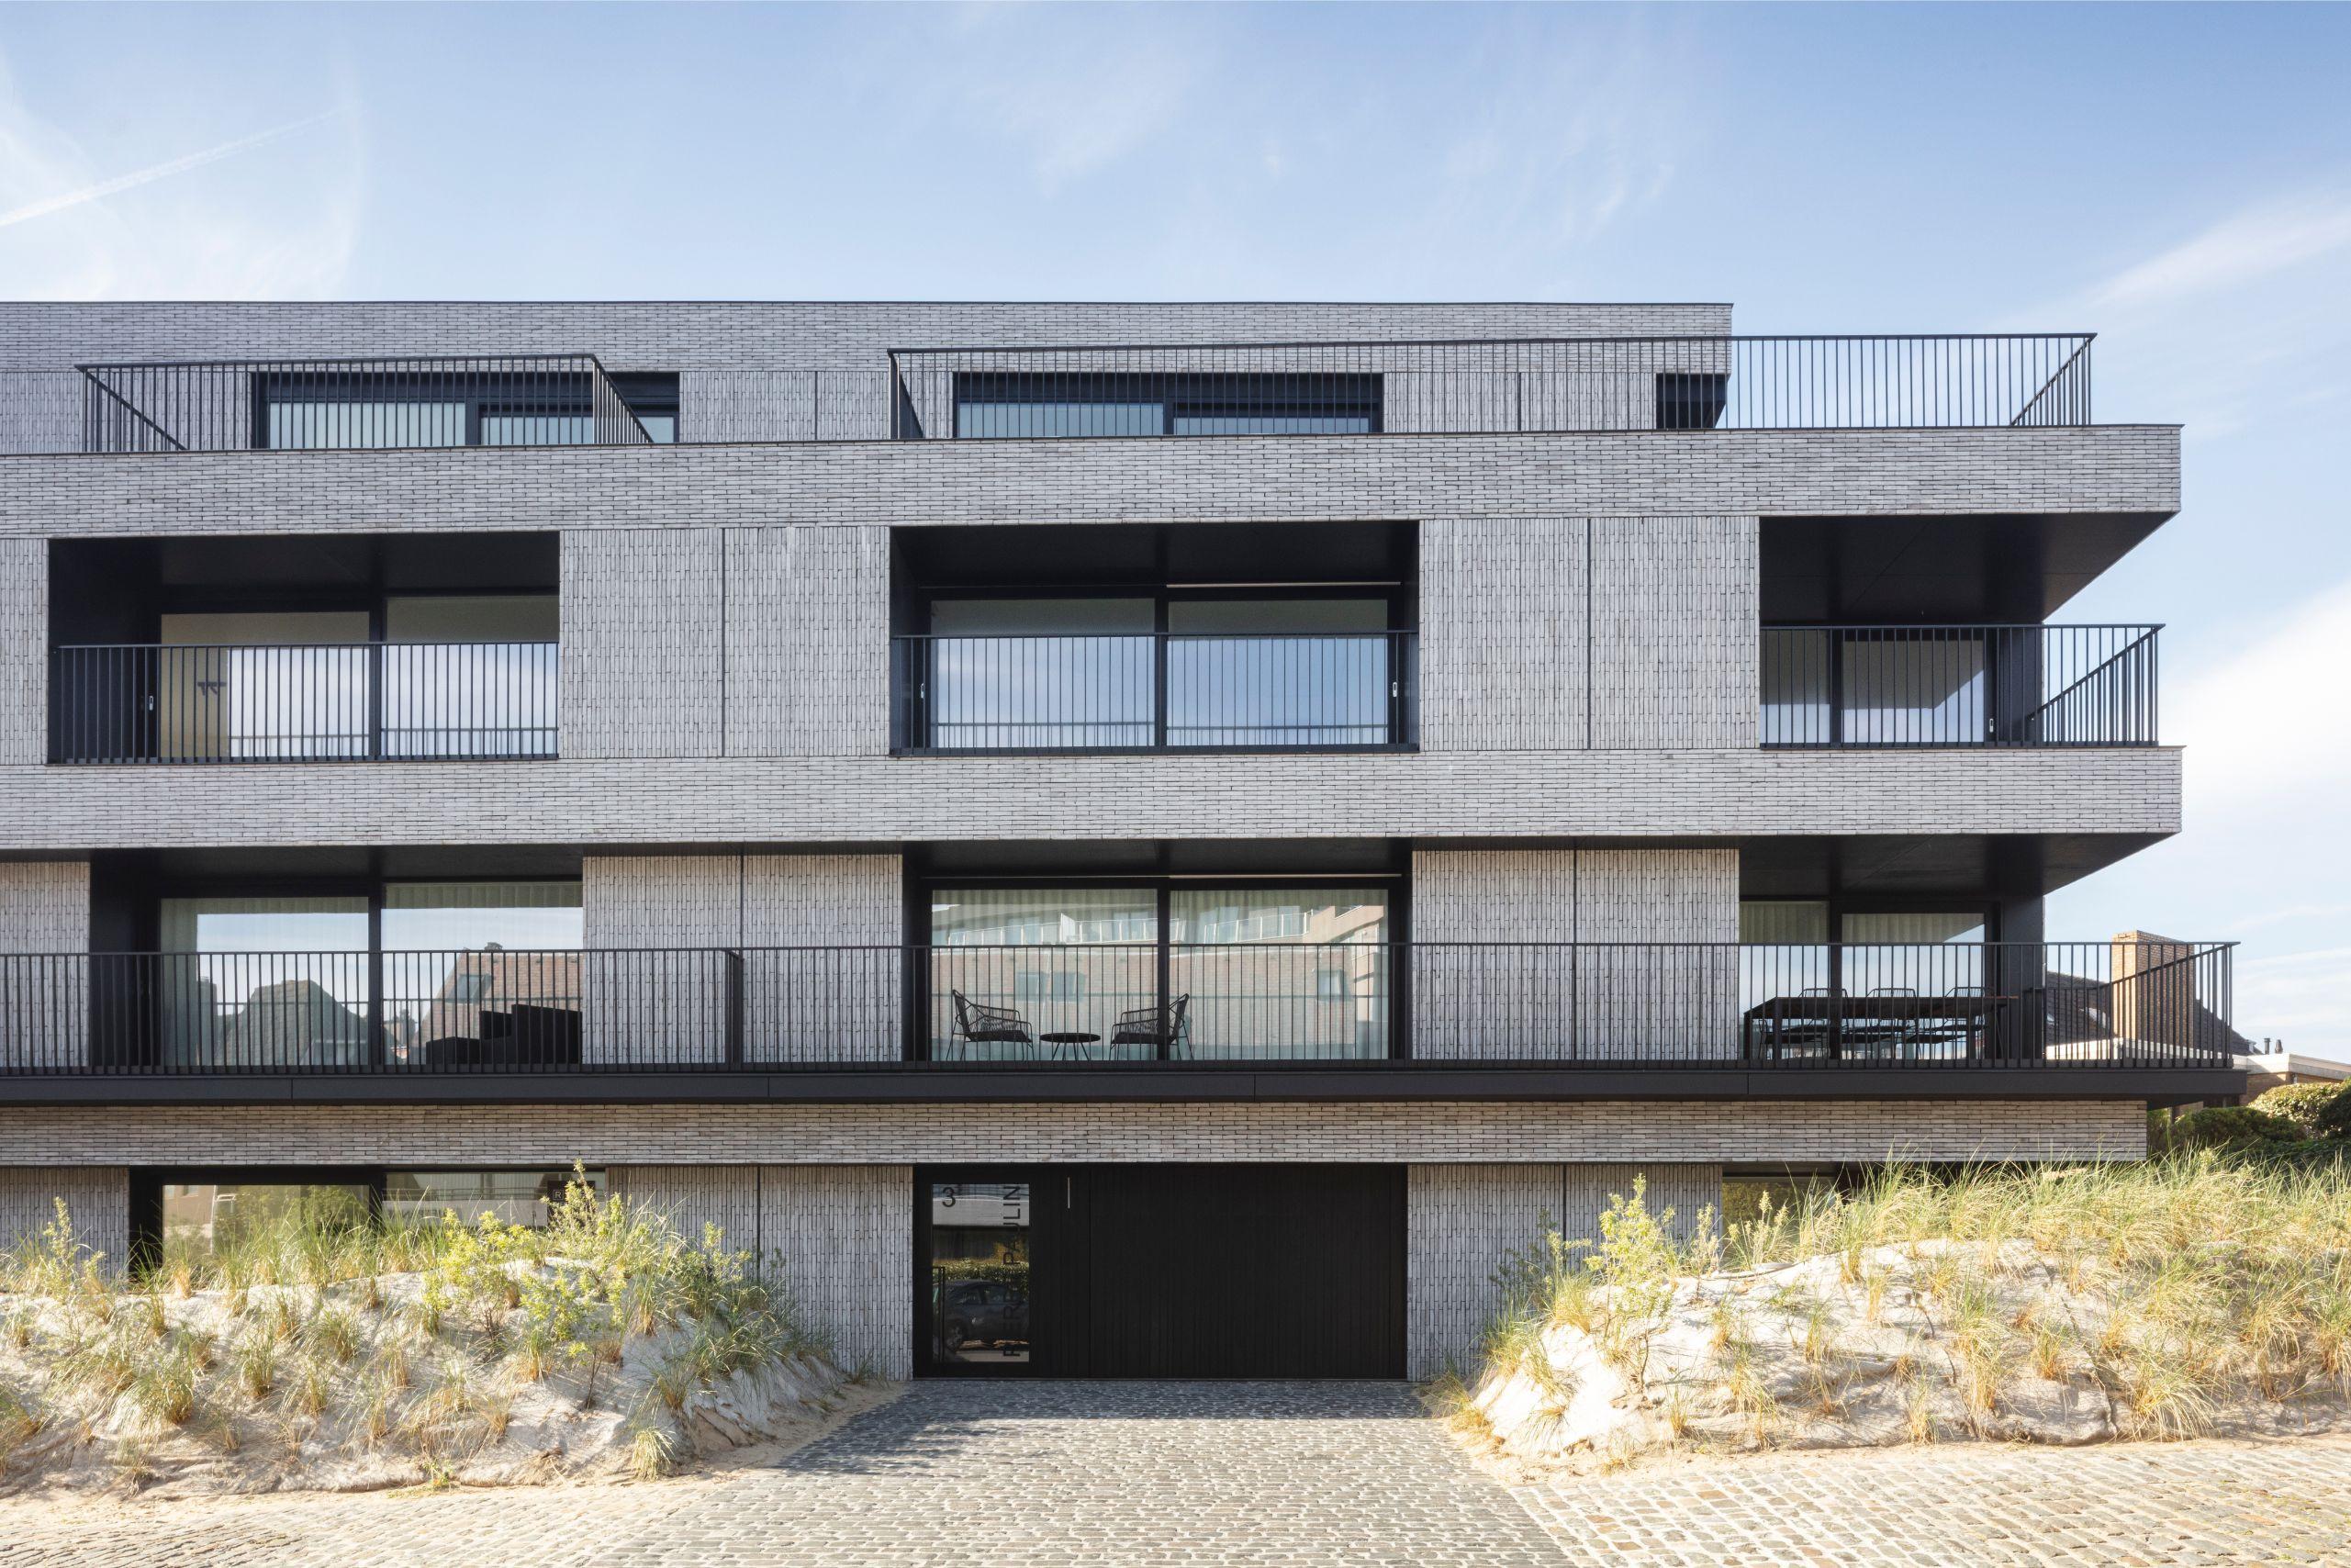 Pierre Paulin - Rietveldprojects - Sint-Idesbald - Tvdv3